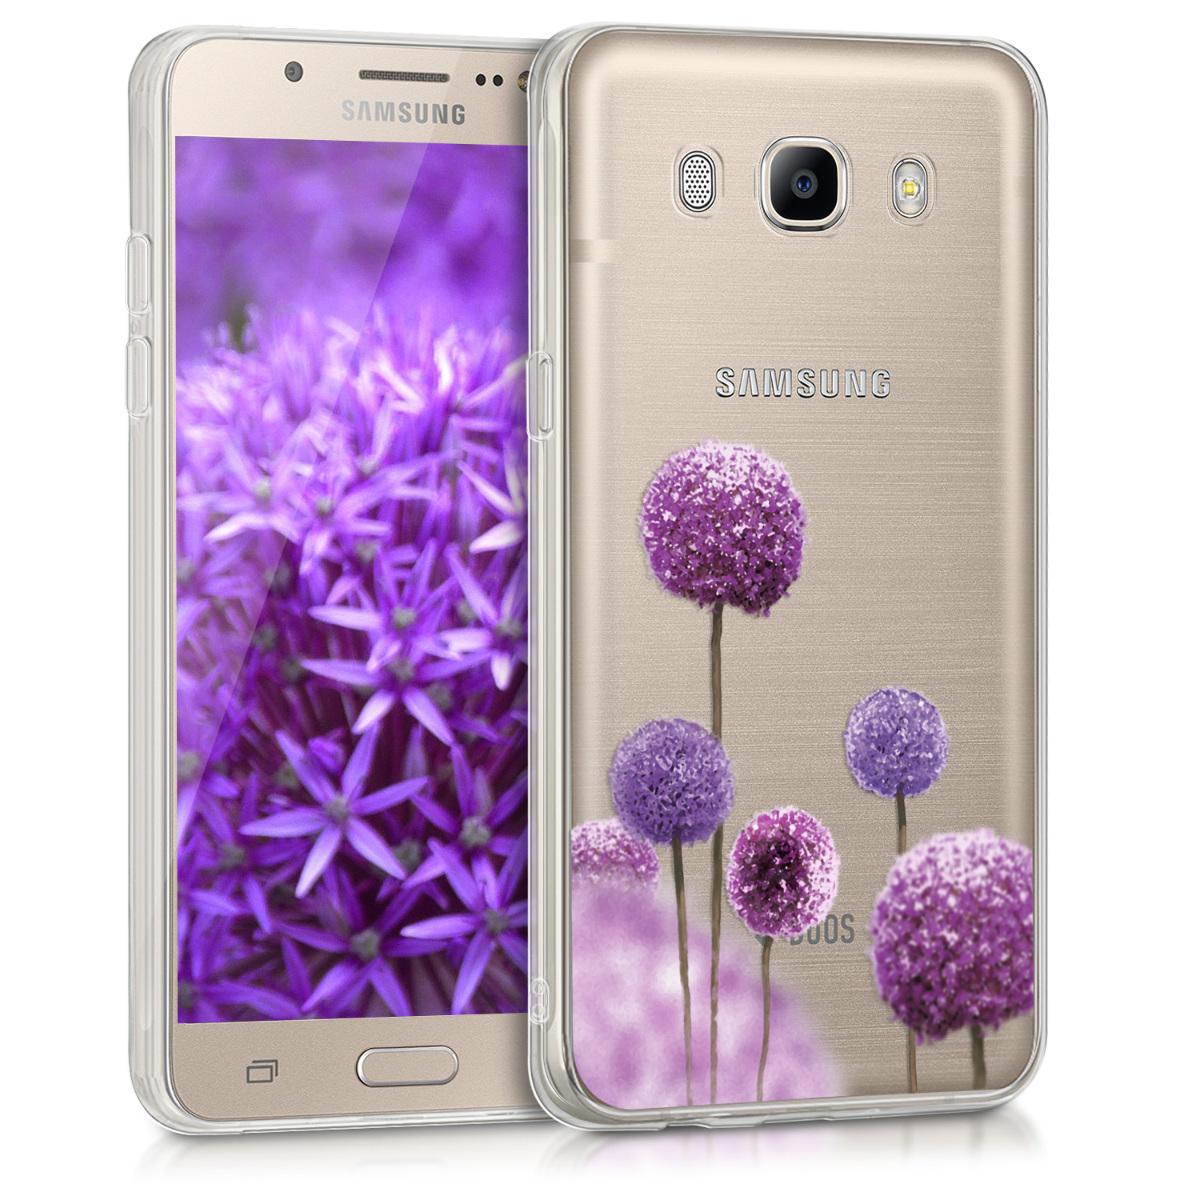 KW Θήκη Σιλικόνης Samsung Galaxy J5 2016 DUOS - Dark Pink / Violet / Transparent (39166.07)